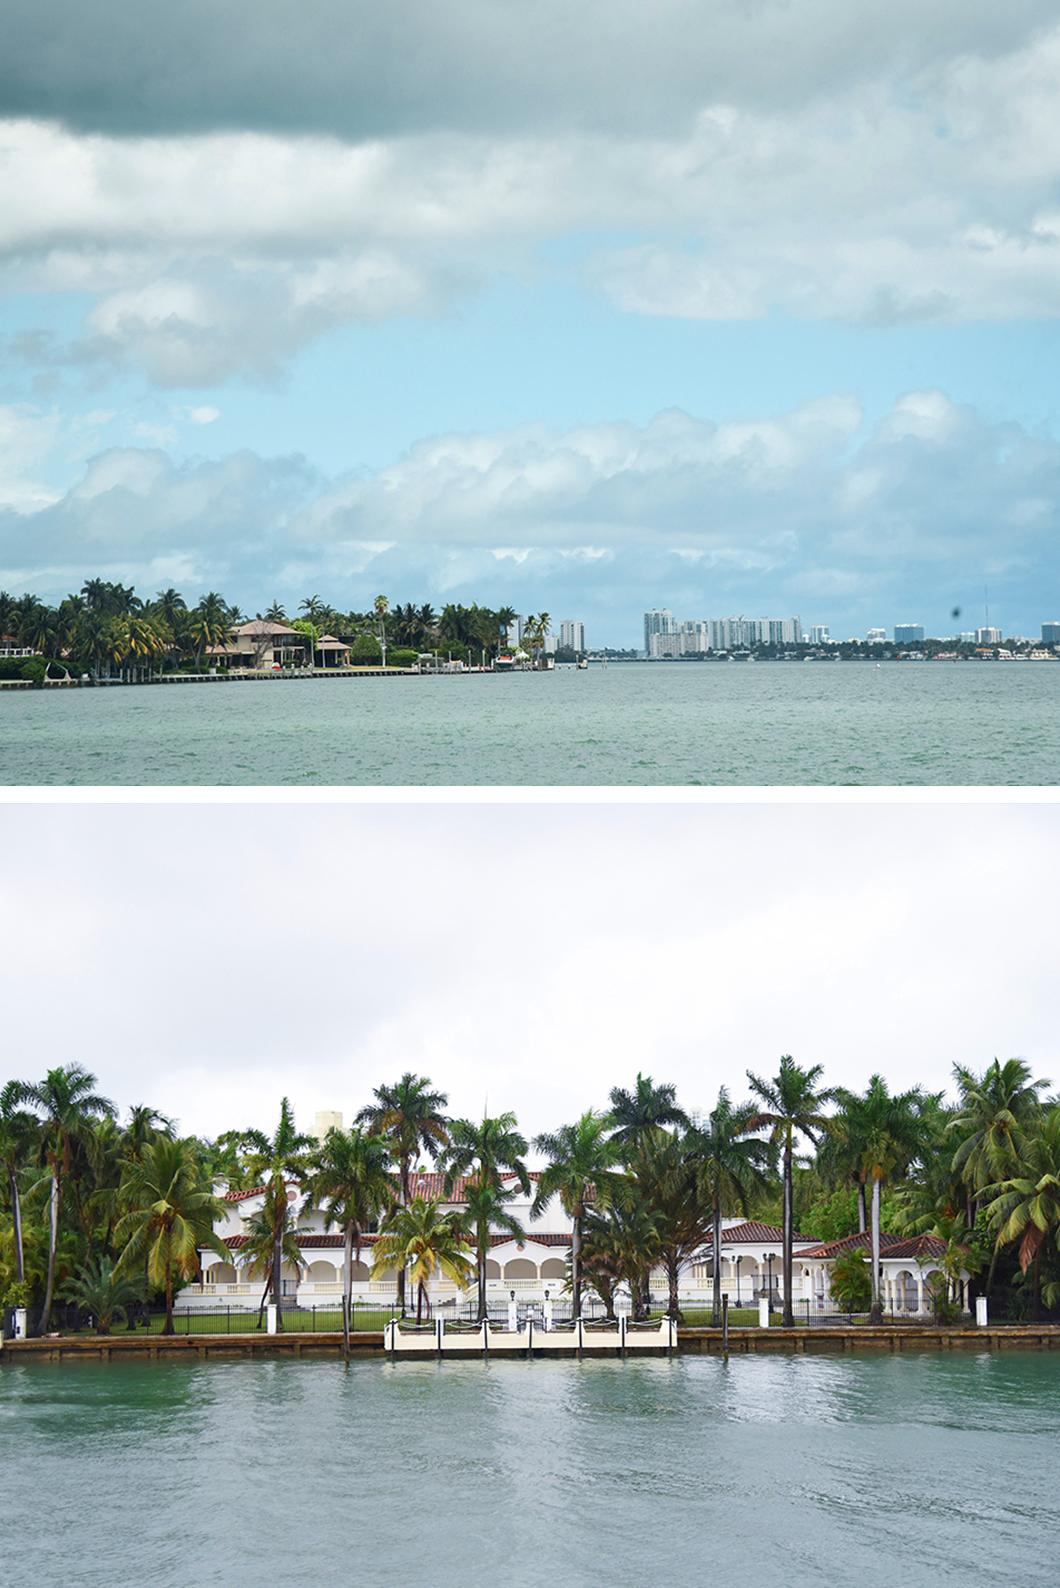 Biscayne Bay, la Baie des milliardaires